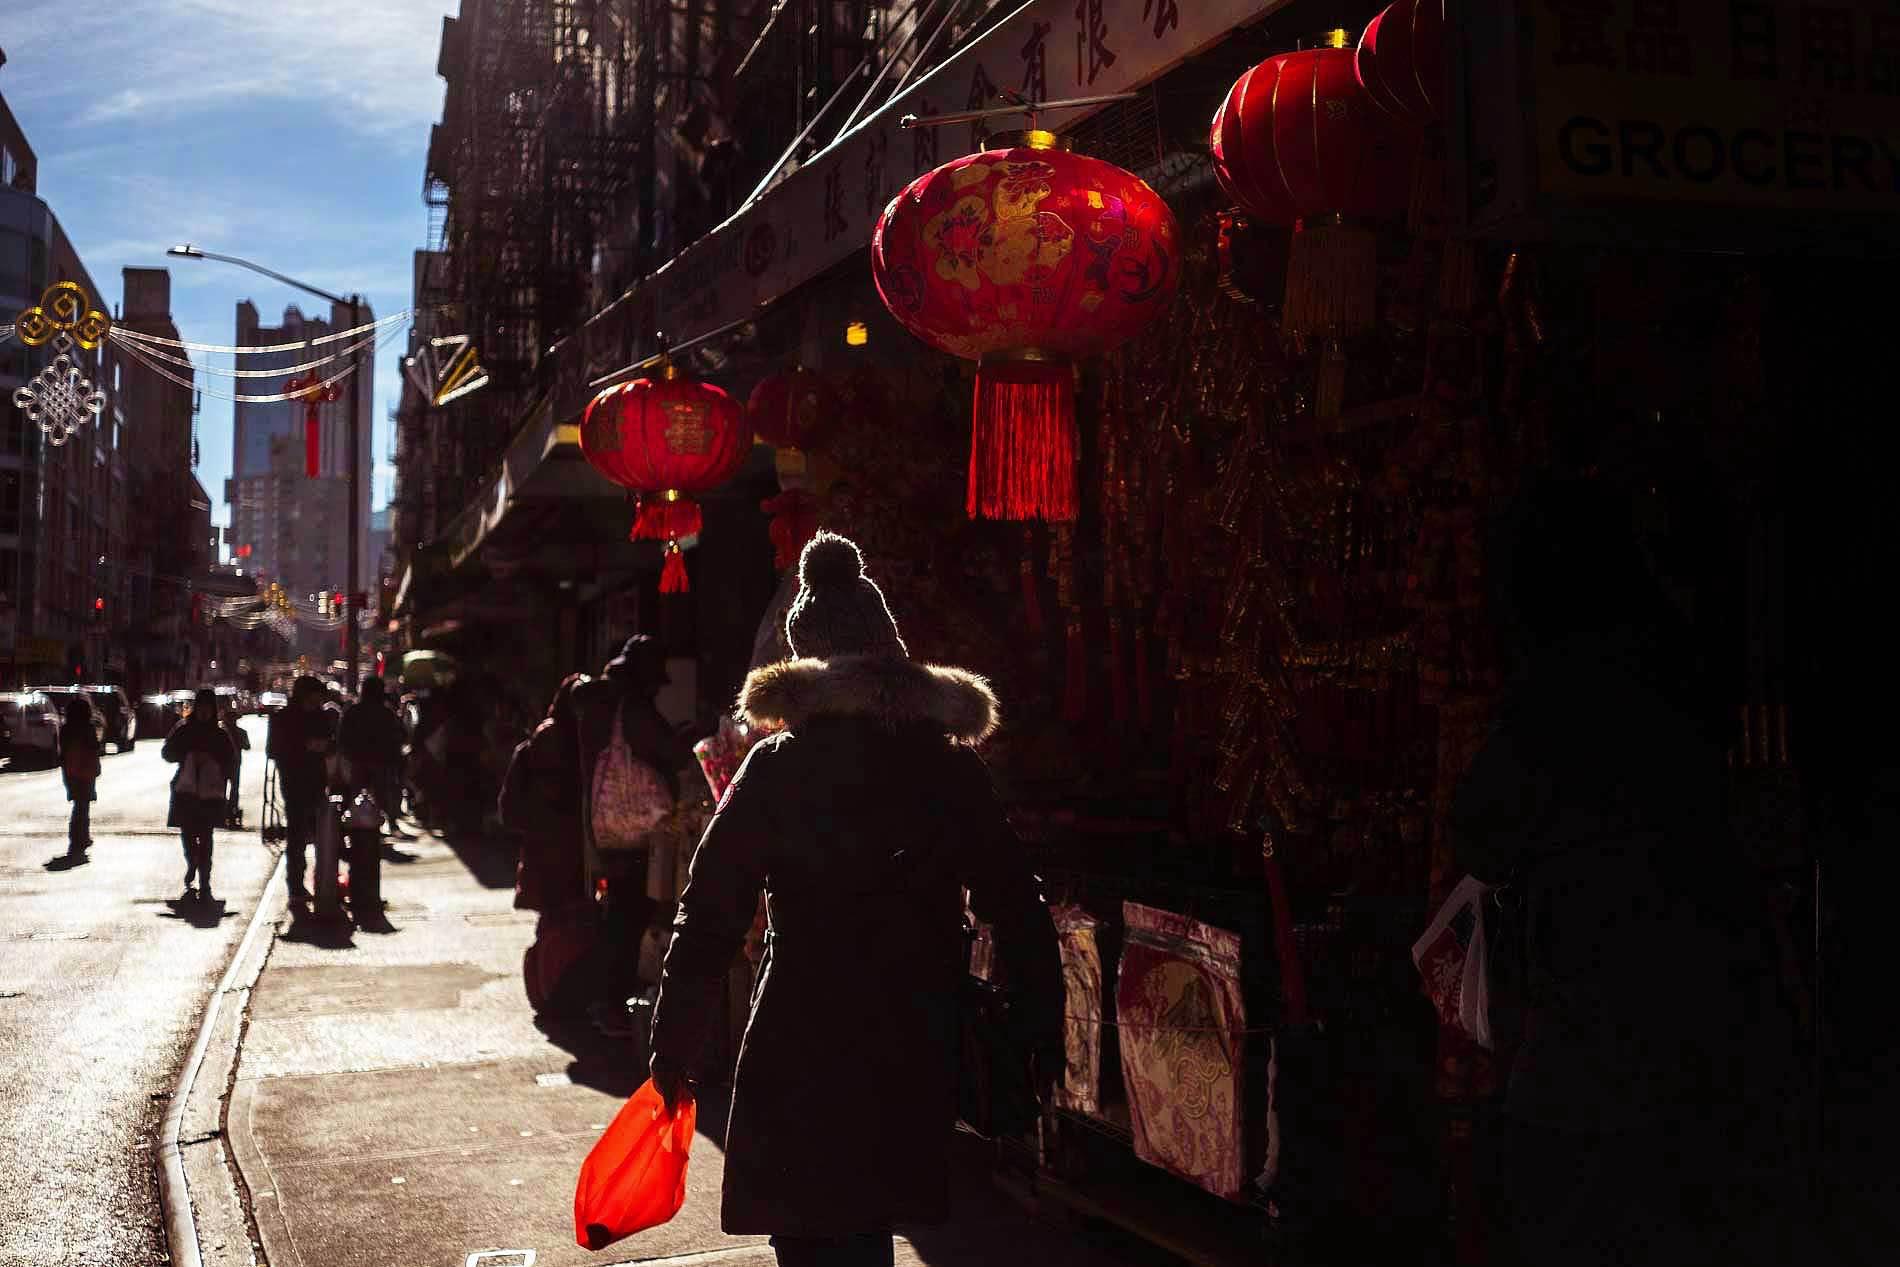 reportage_travel_newyork_martinfrick-8633